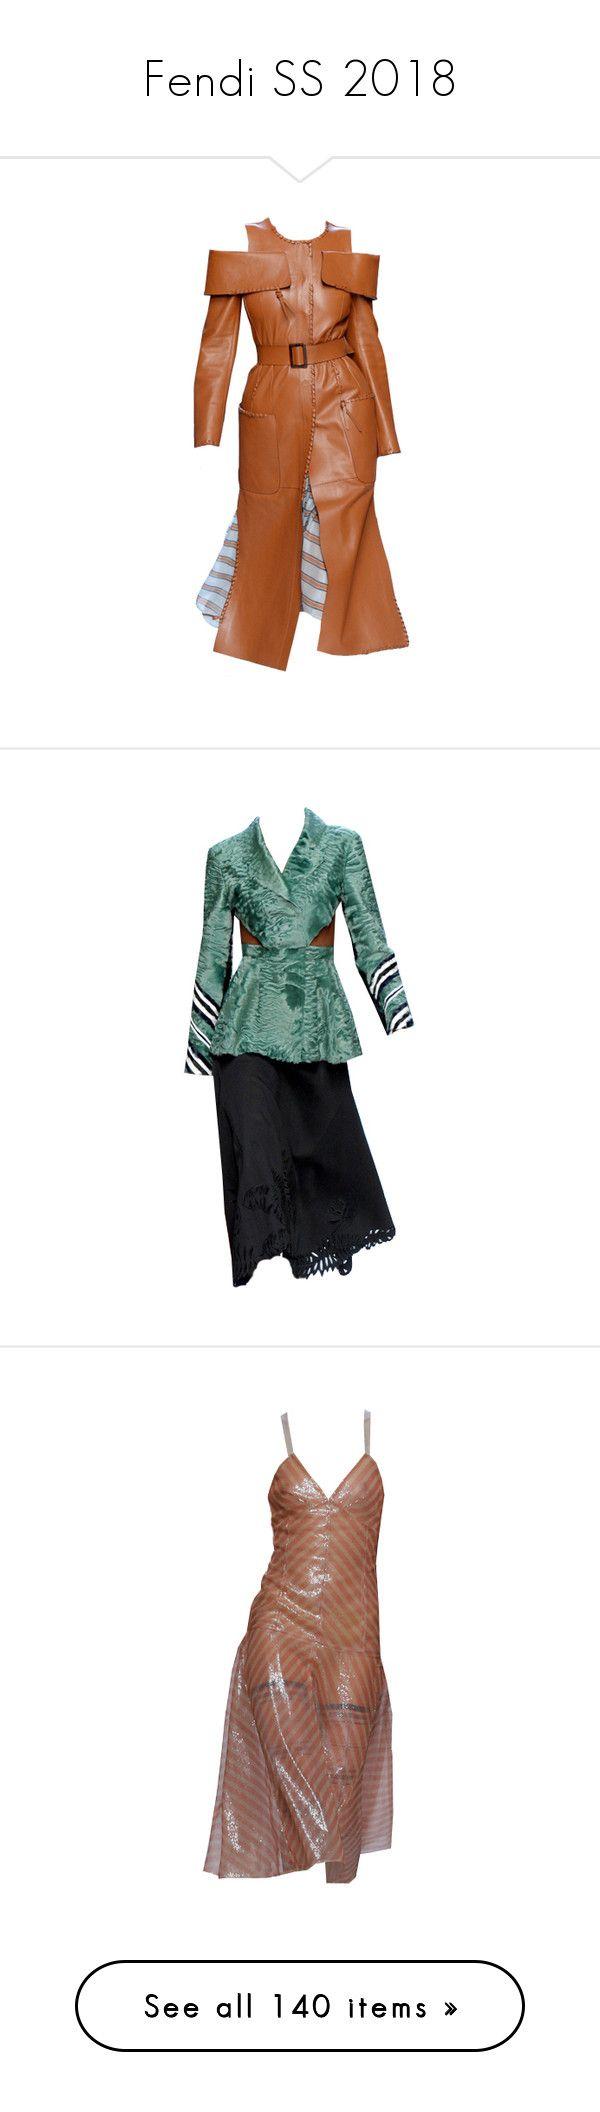 """Fendi SS 2018"" by sella103 ❤ liked on Polyvore featuring skirts, green, mid-calf skirt, fendi, midi flare skirt, knee length flared skirts, flared skirt, black, mid length skirts and flared skirts"